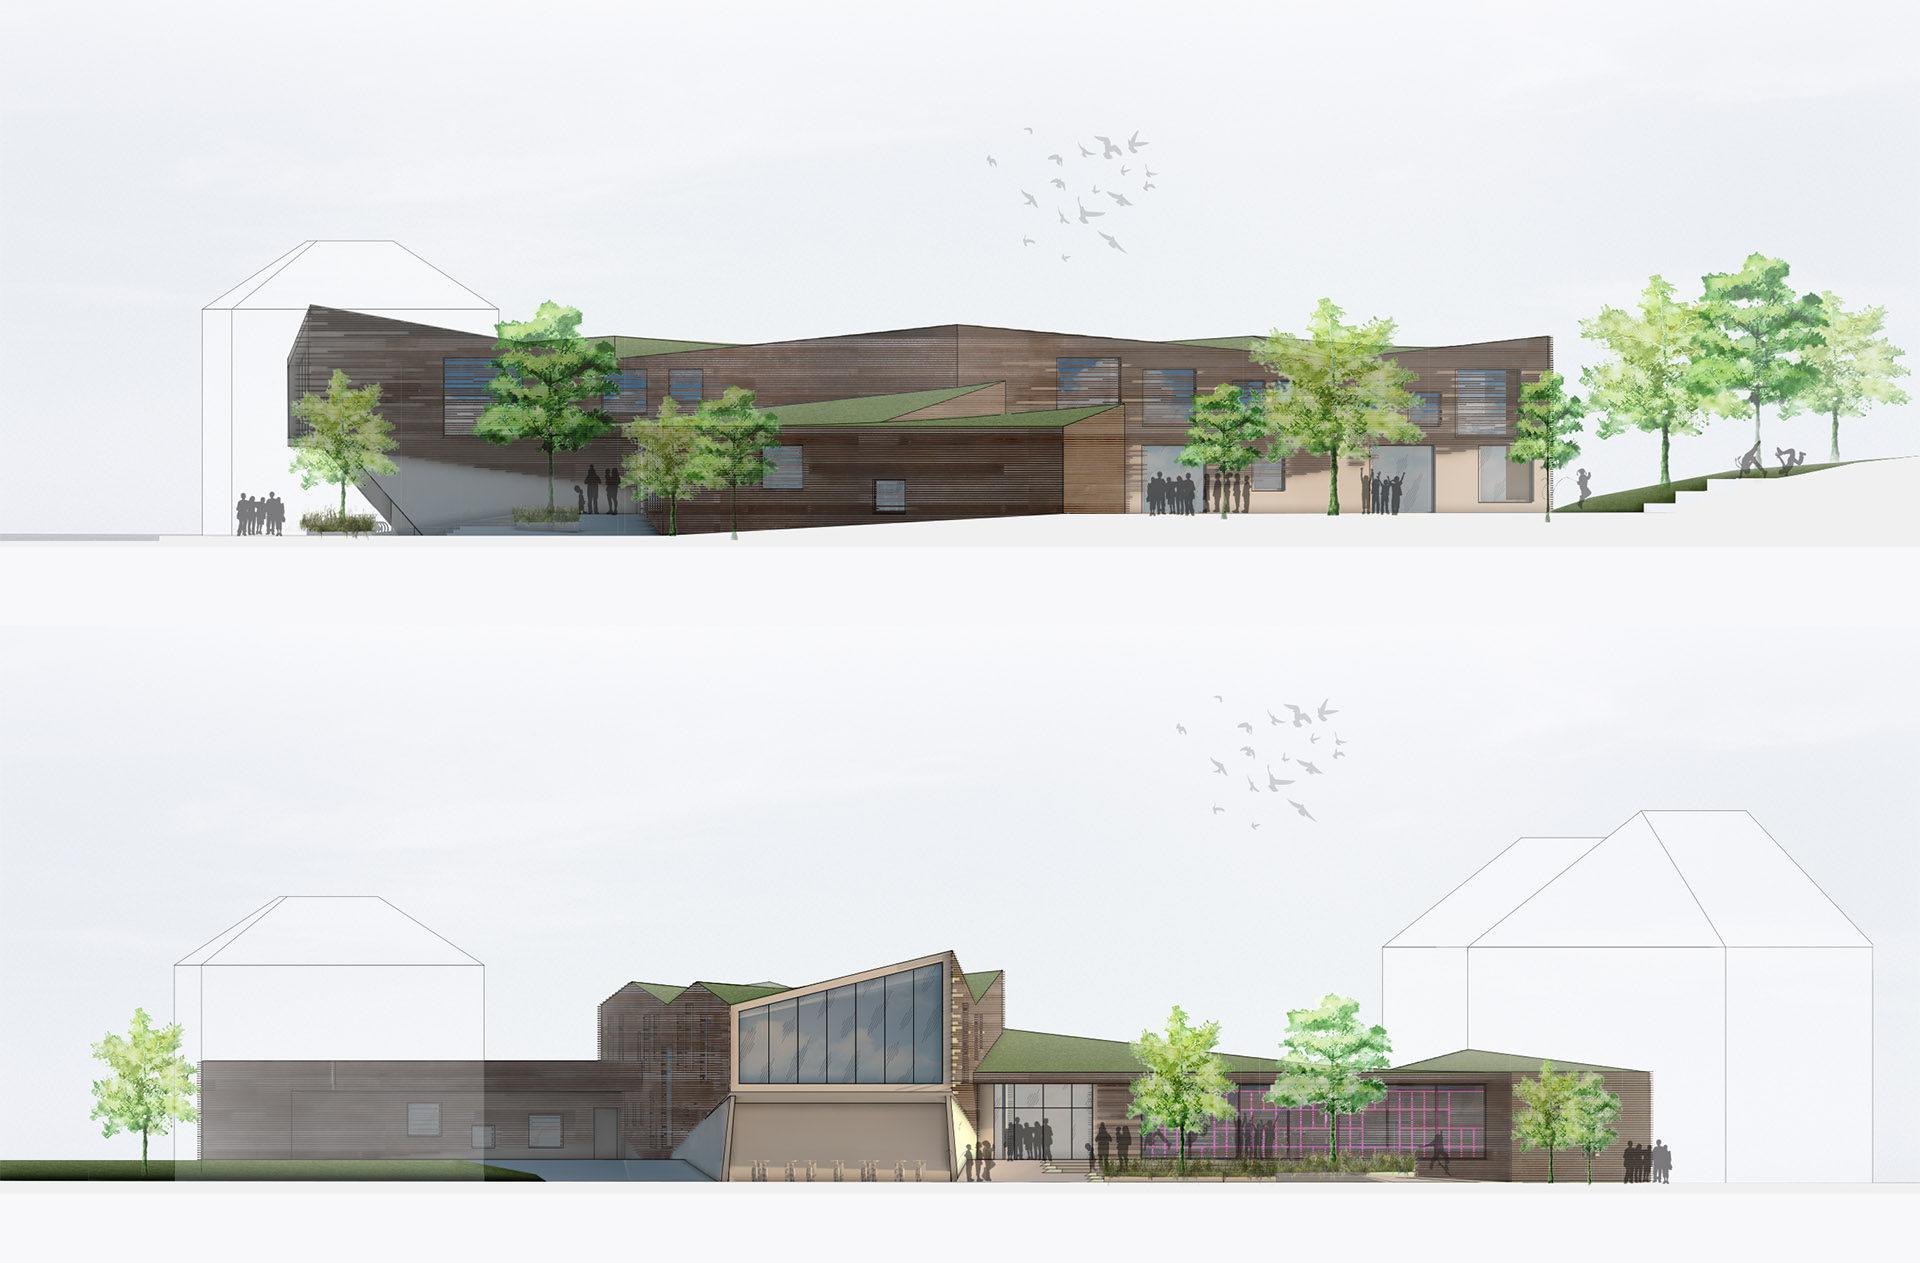 Architekt Radebeul hortgebäude radebeul architekturfabrik mingrone melchert klatte